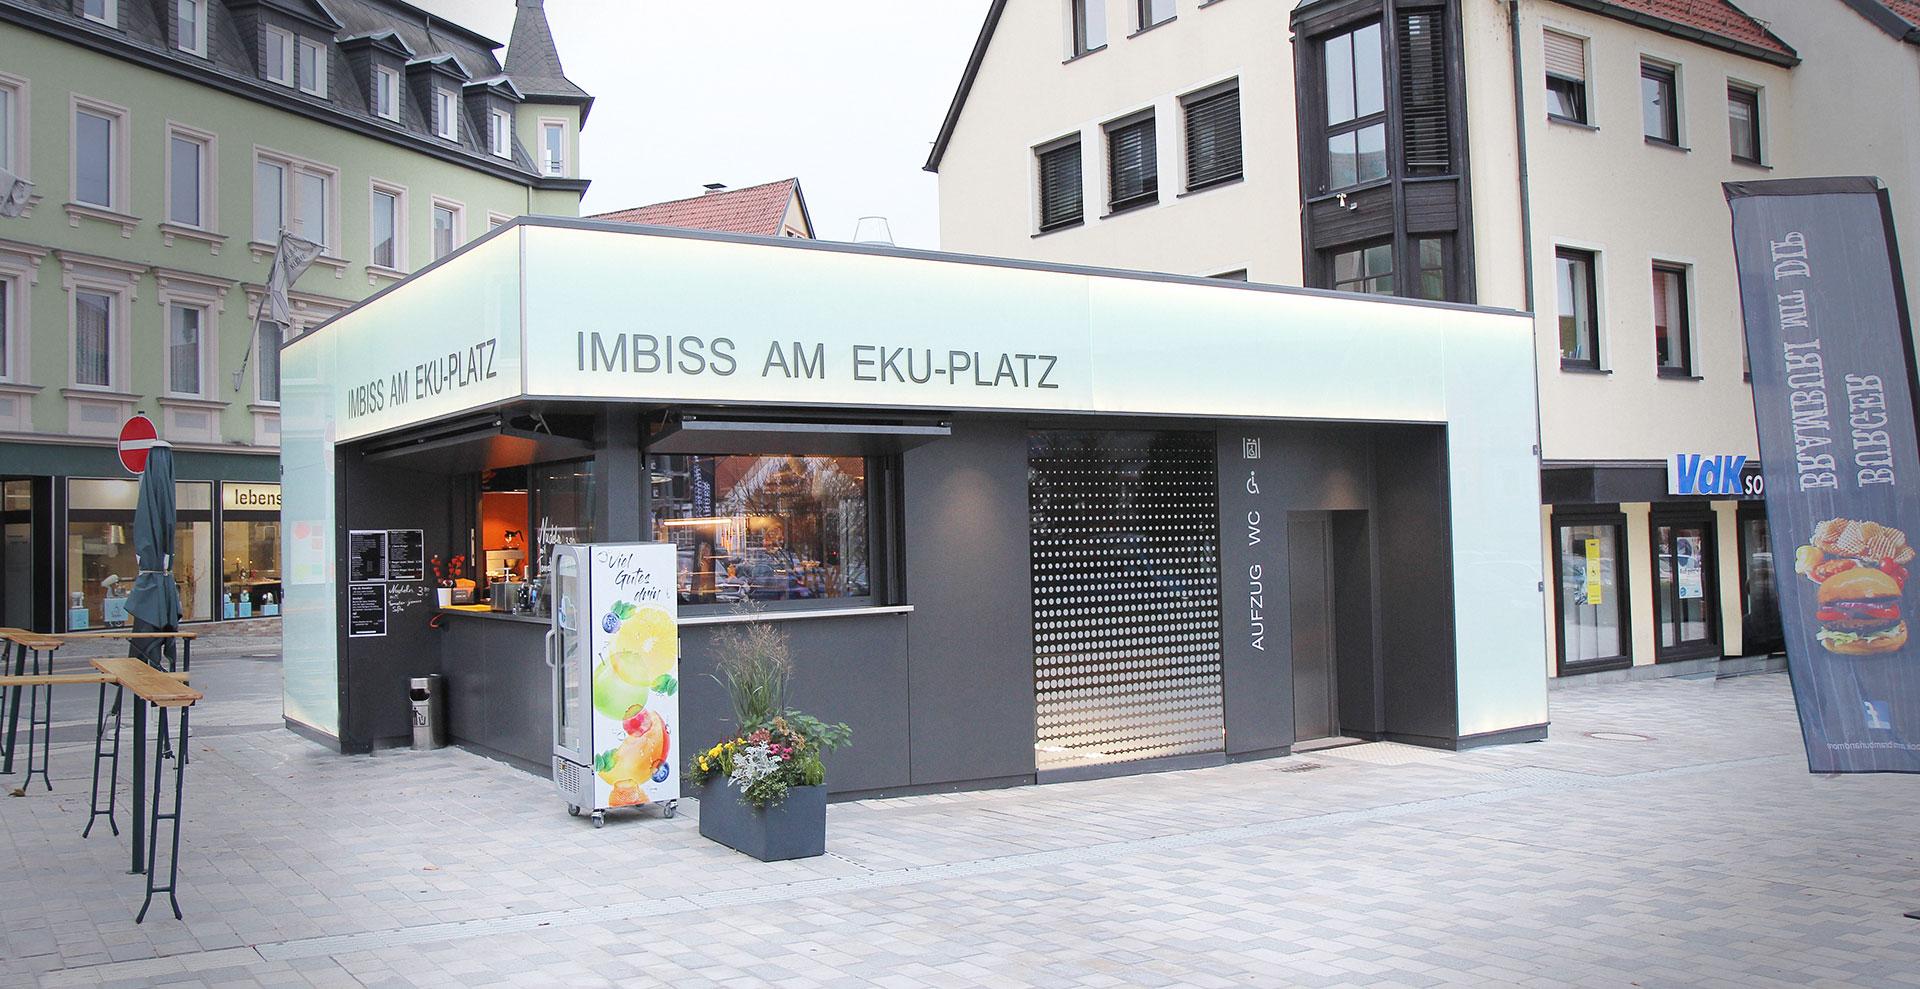 Imbiss am EKU-Platz